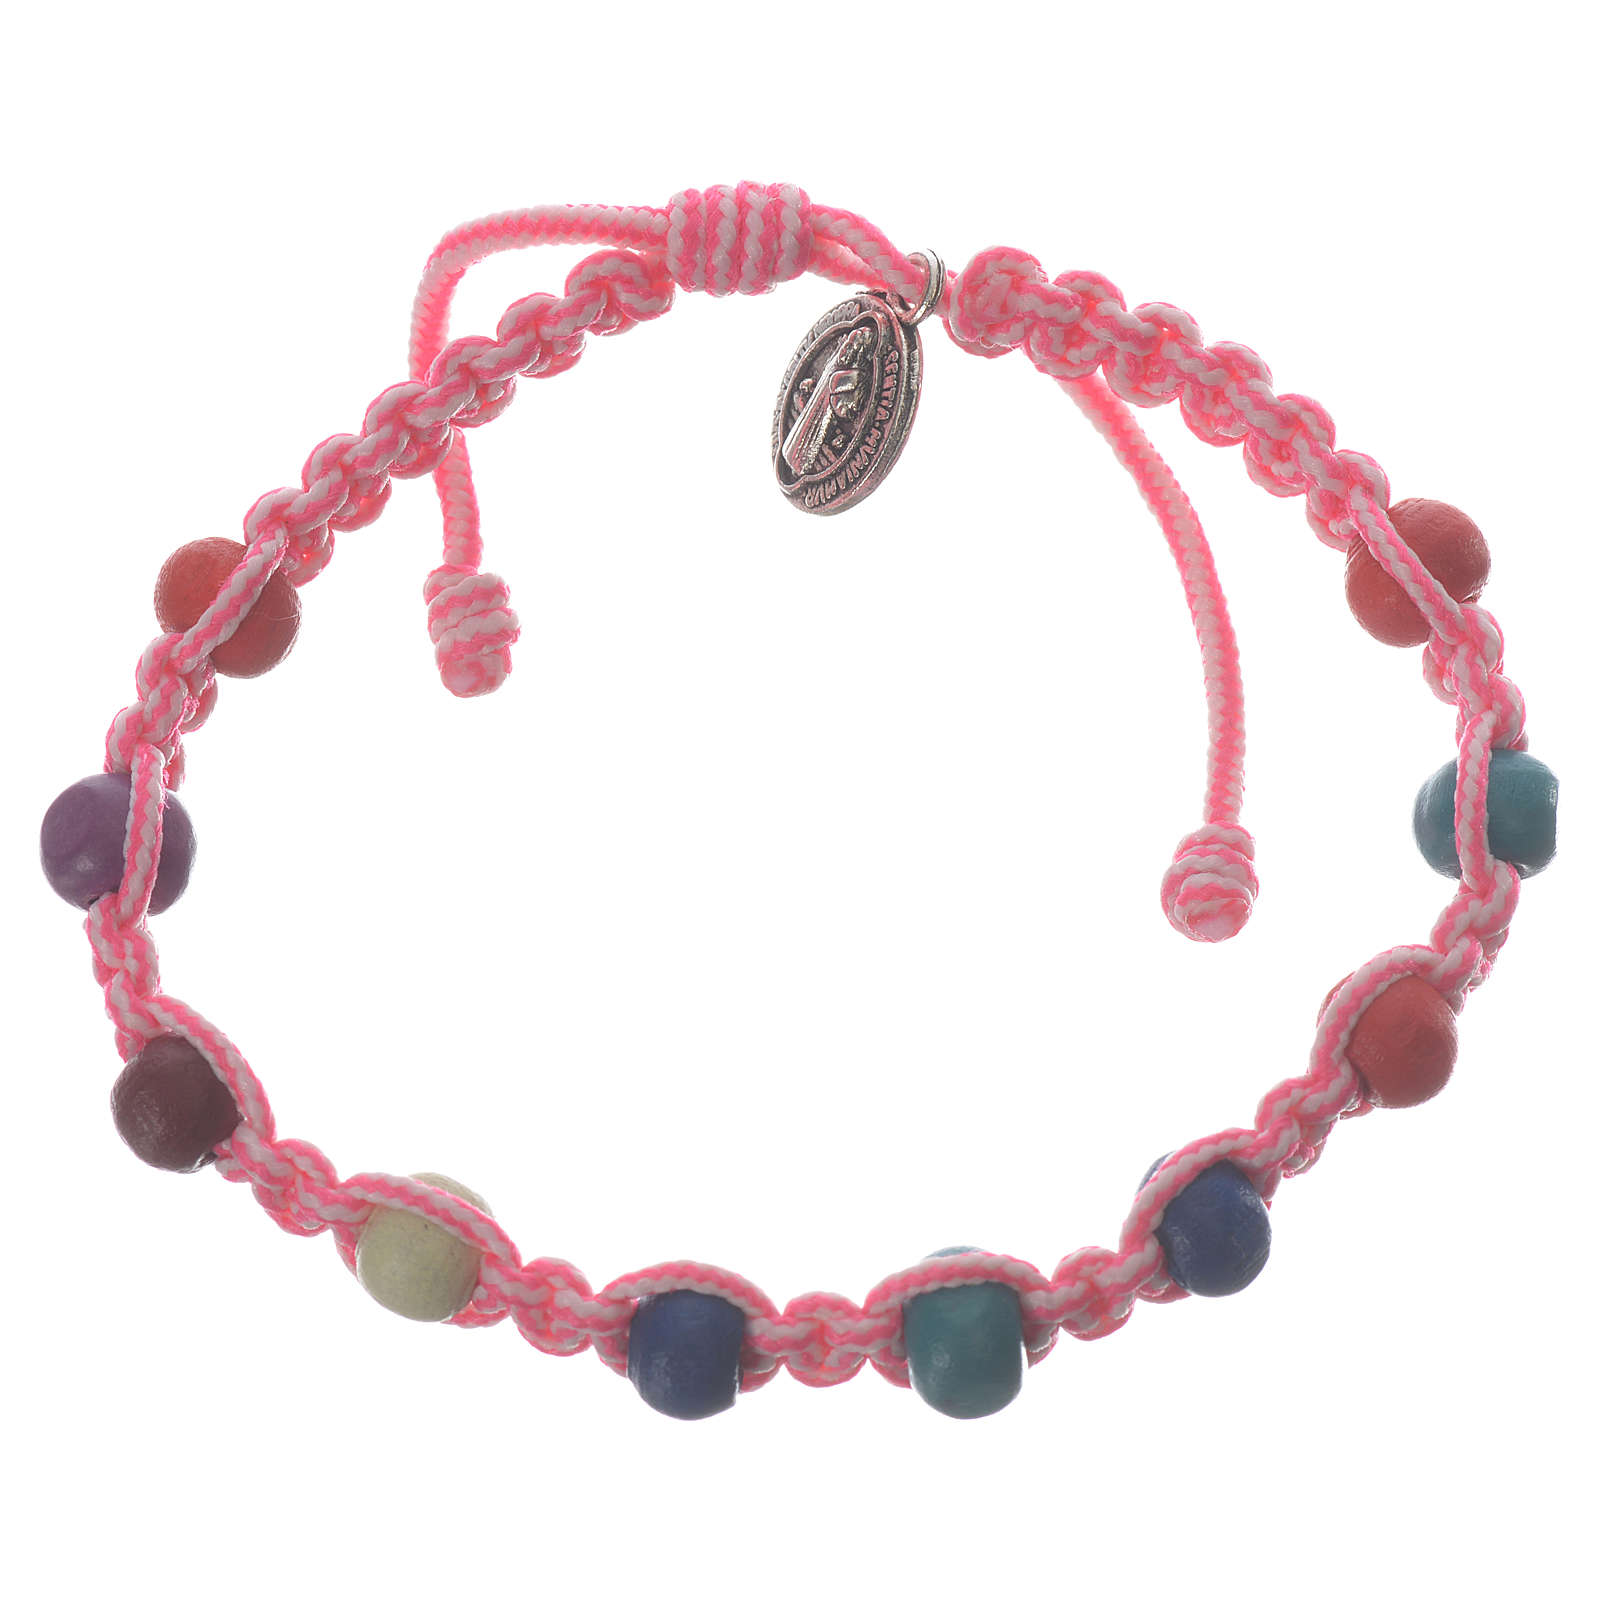 Bracciale decina bambino Medjugorje filo rosa-bianco 4